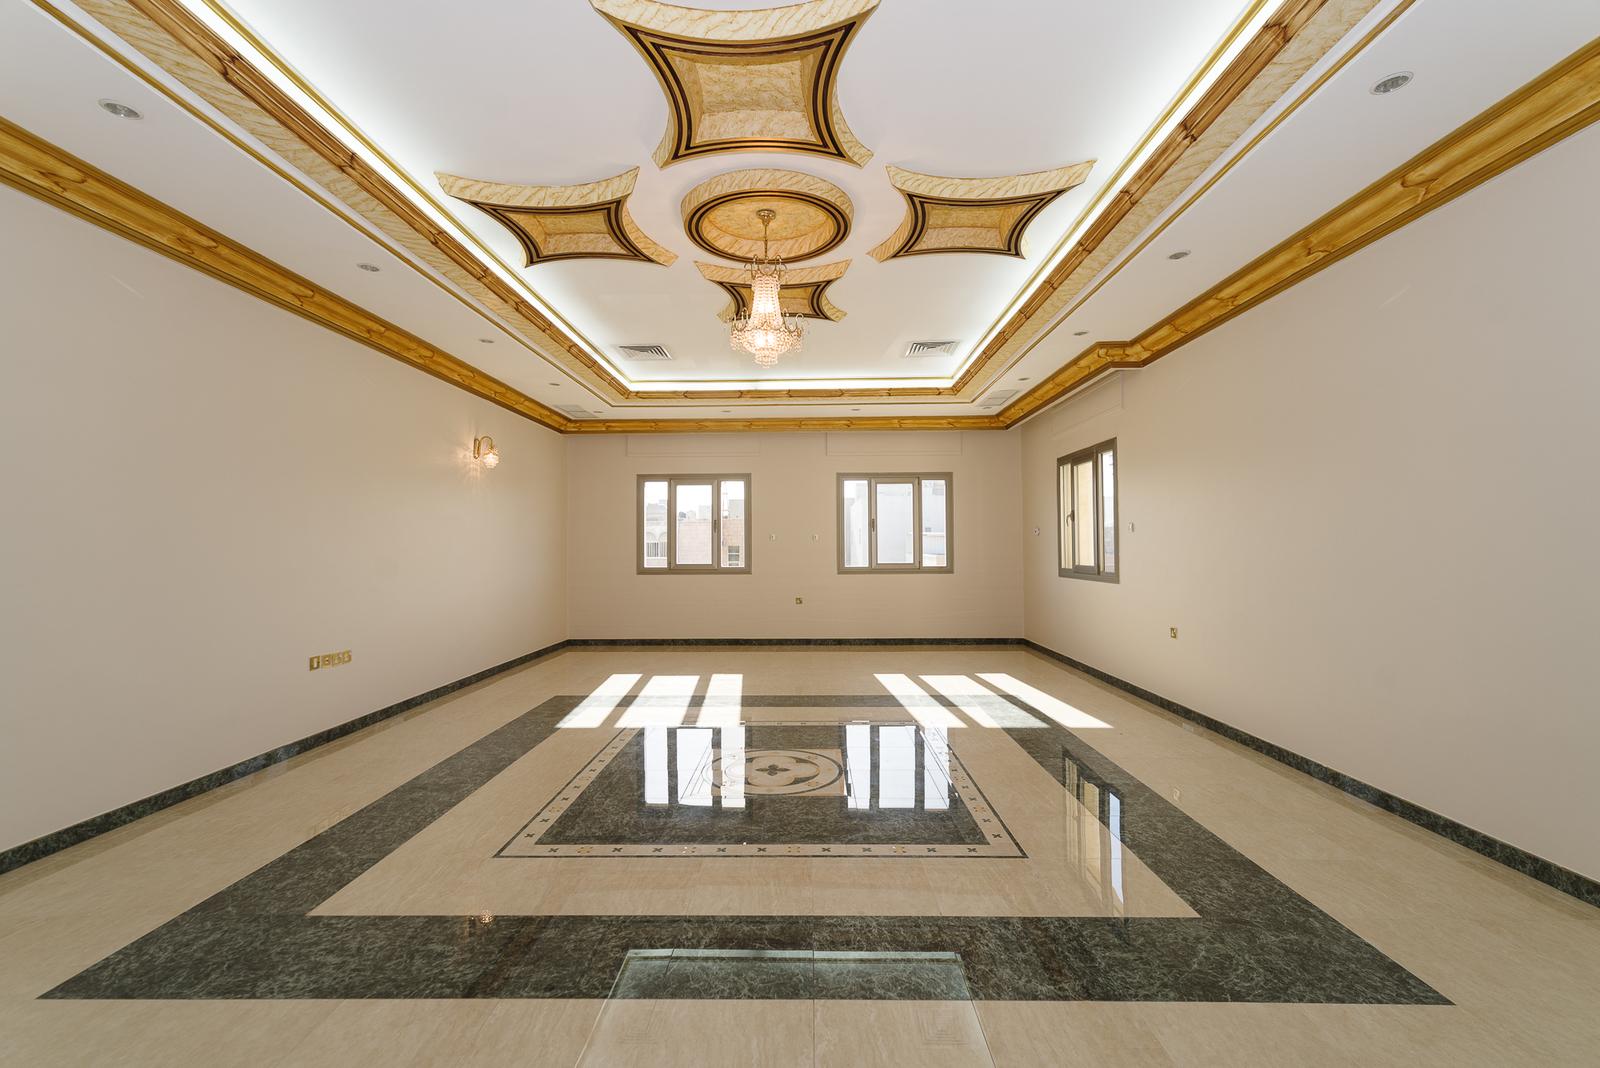 Bayan – fantastic, spacious, unfurnished five bedroom floor